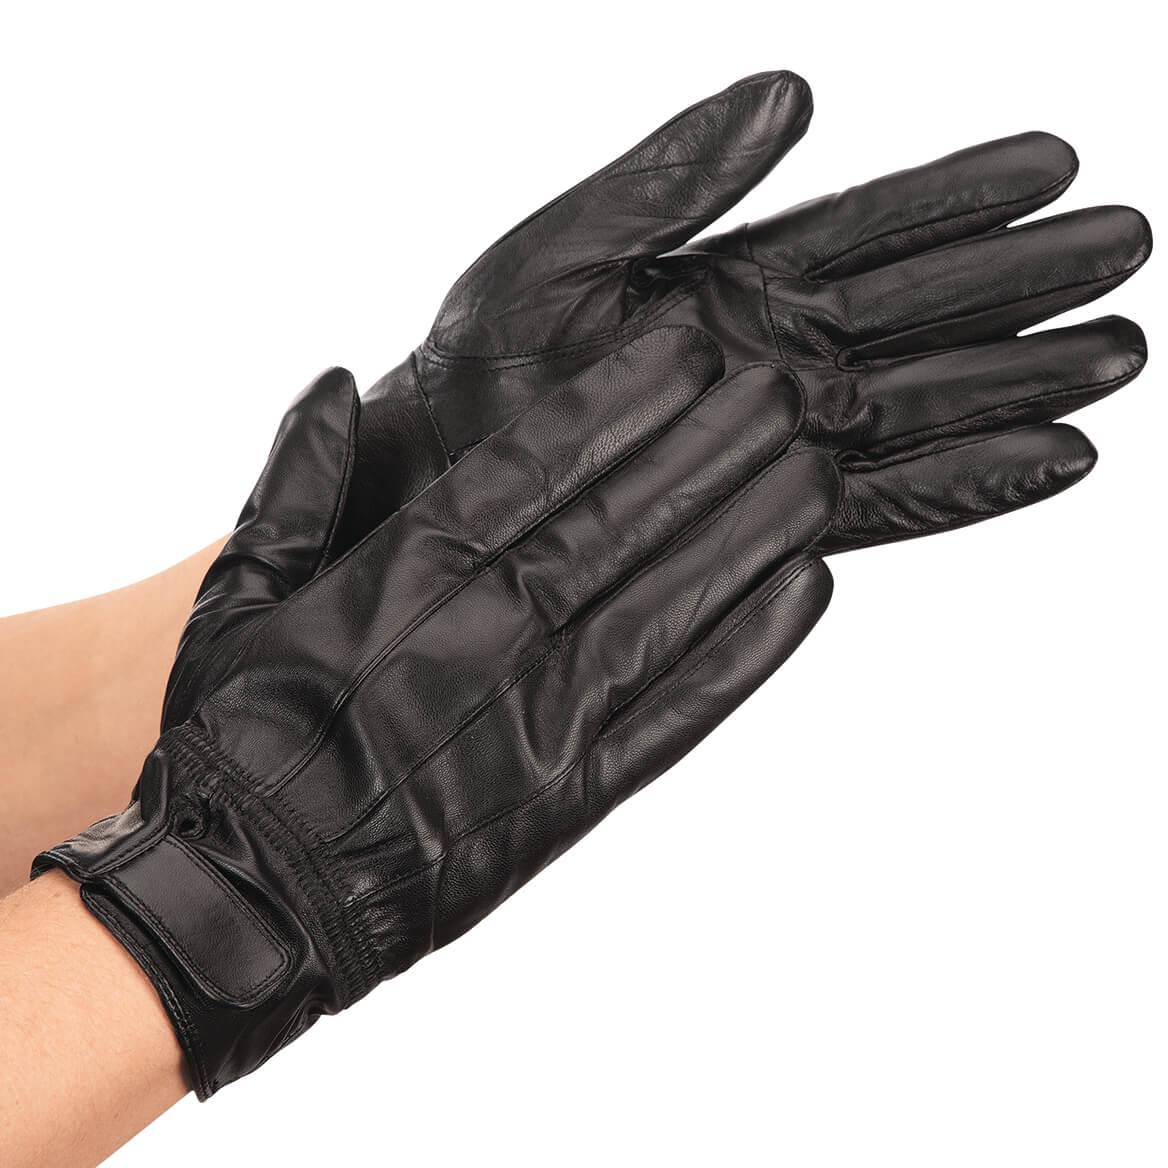 Men's Leather Gloves-368098